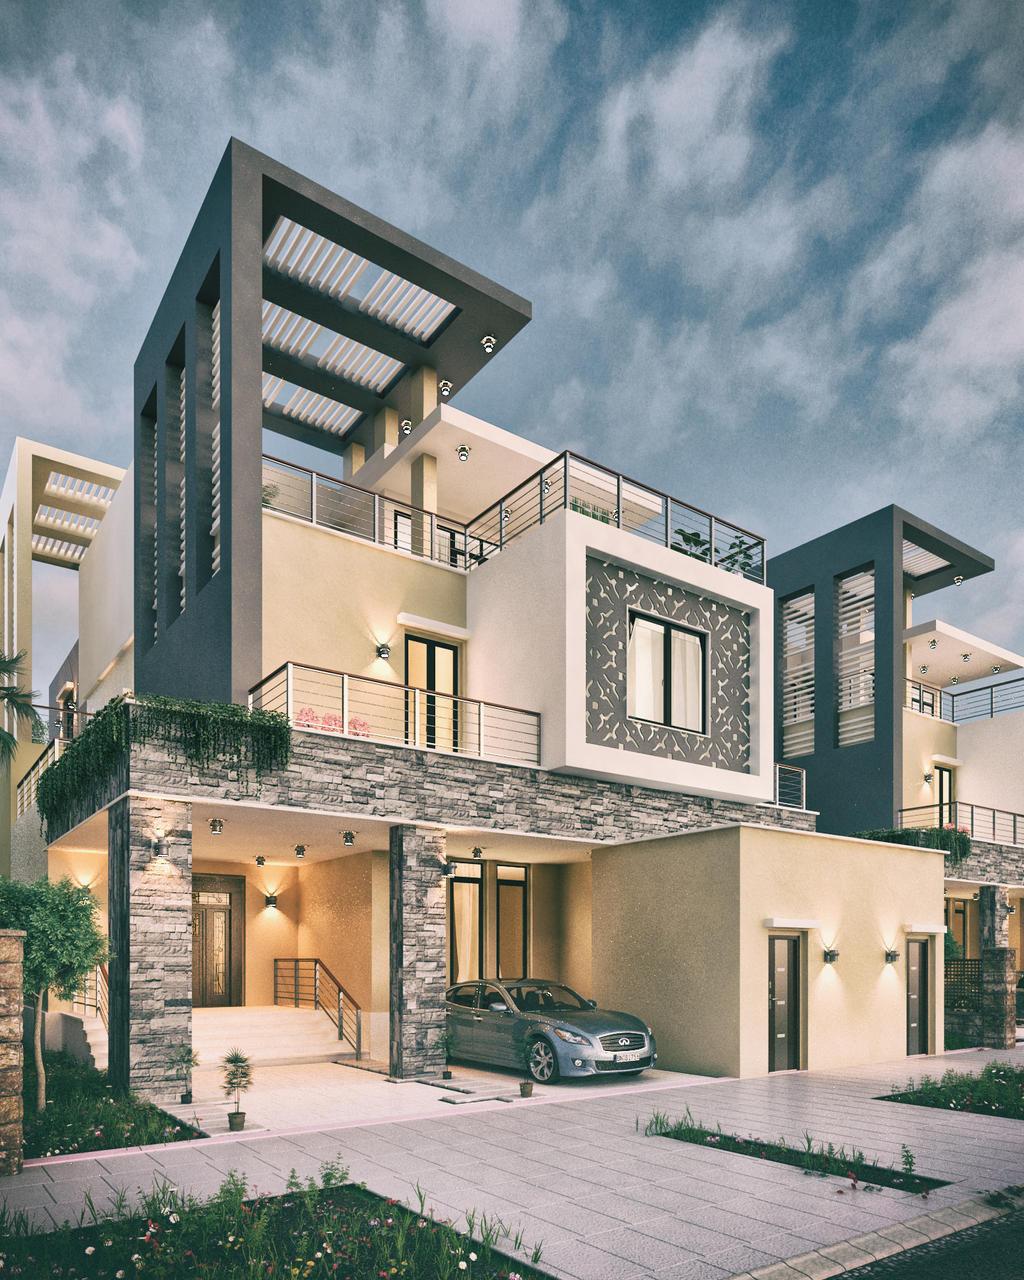 private villa facades design ksa by m salman on deviantart